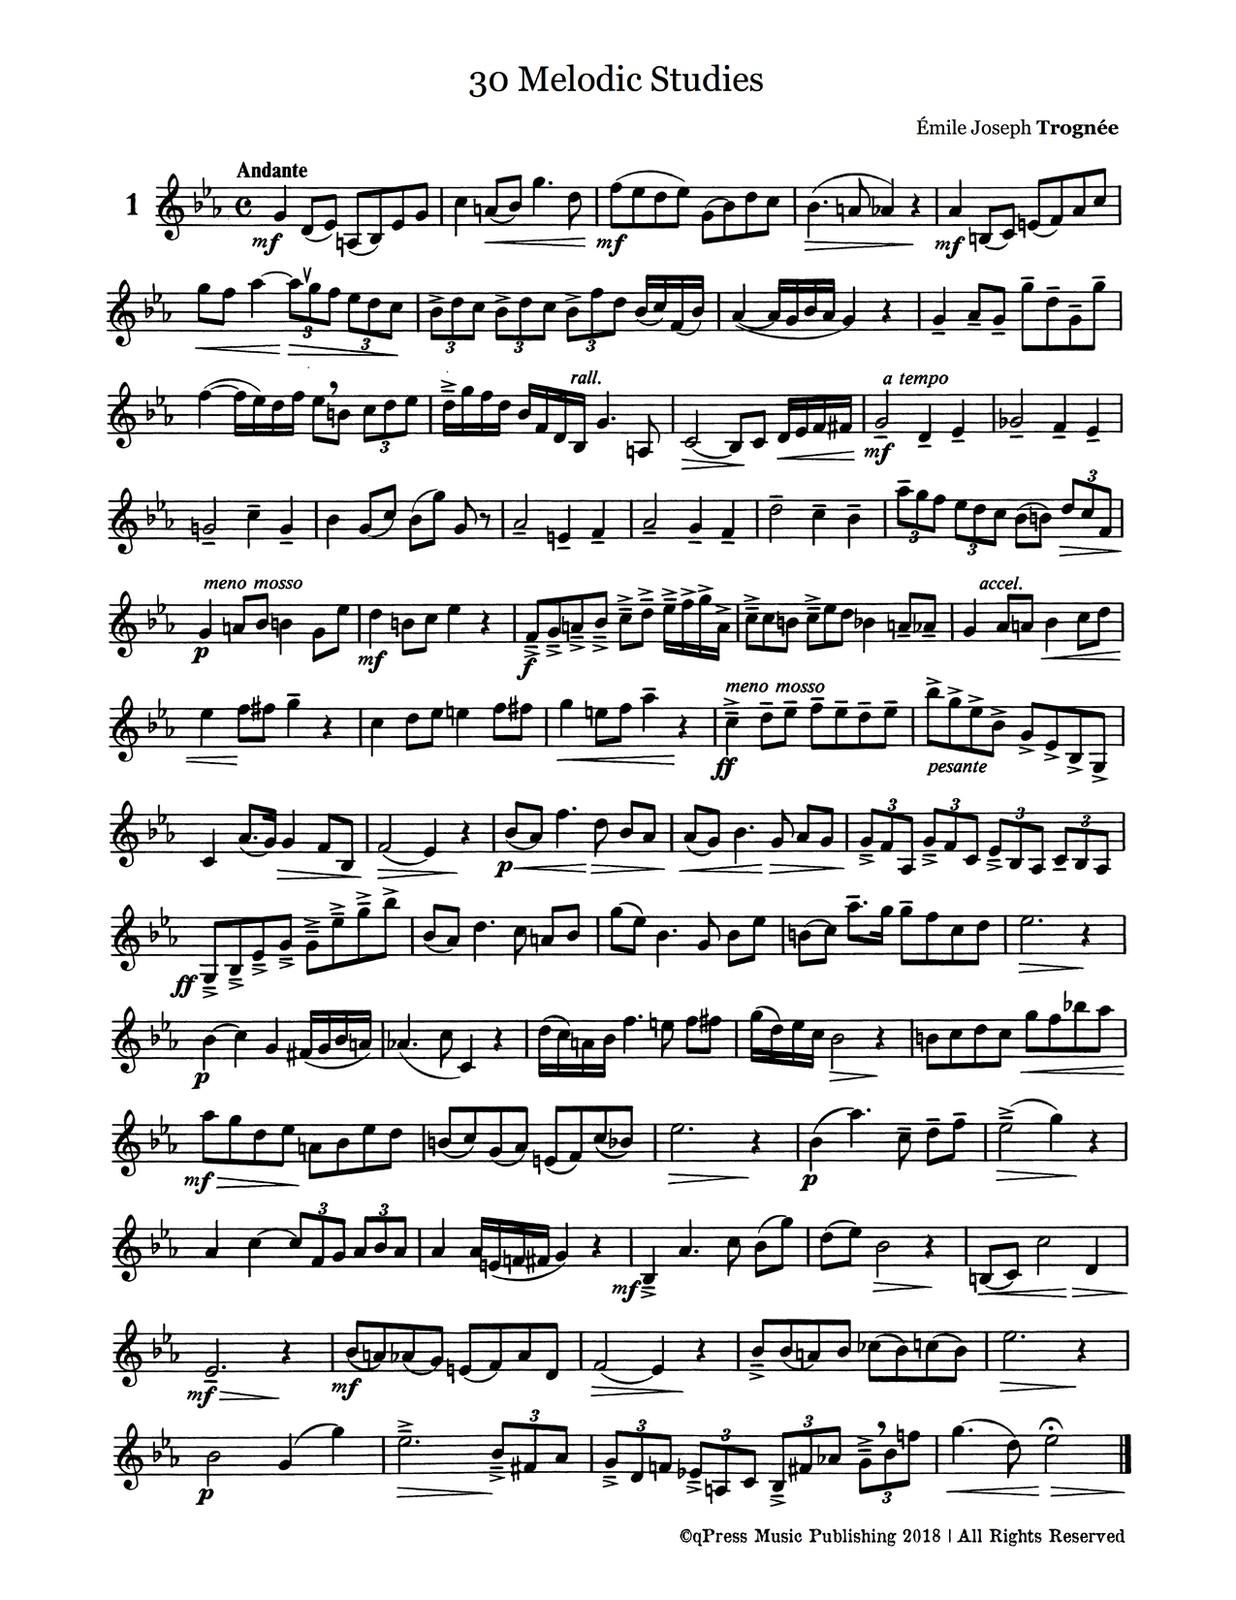 Trognee, 30 Melodic Studies-p02